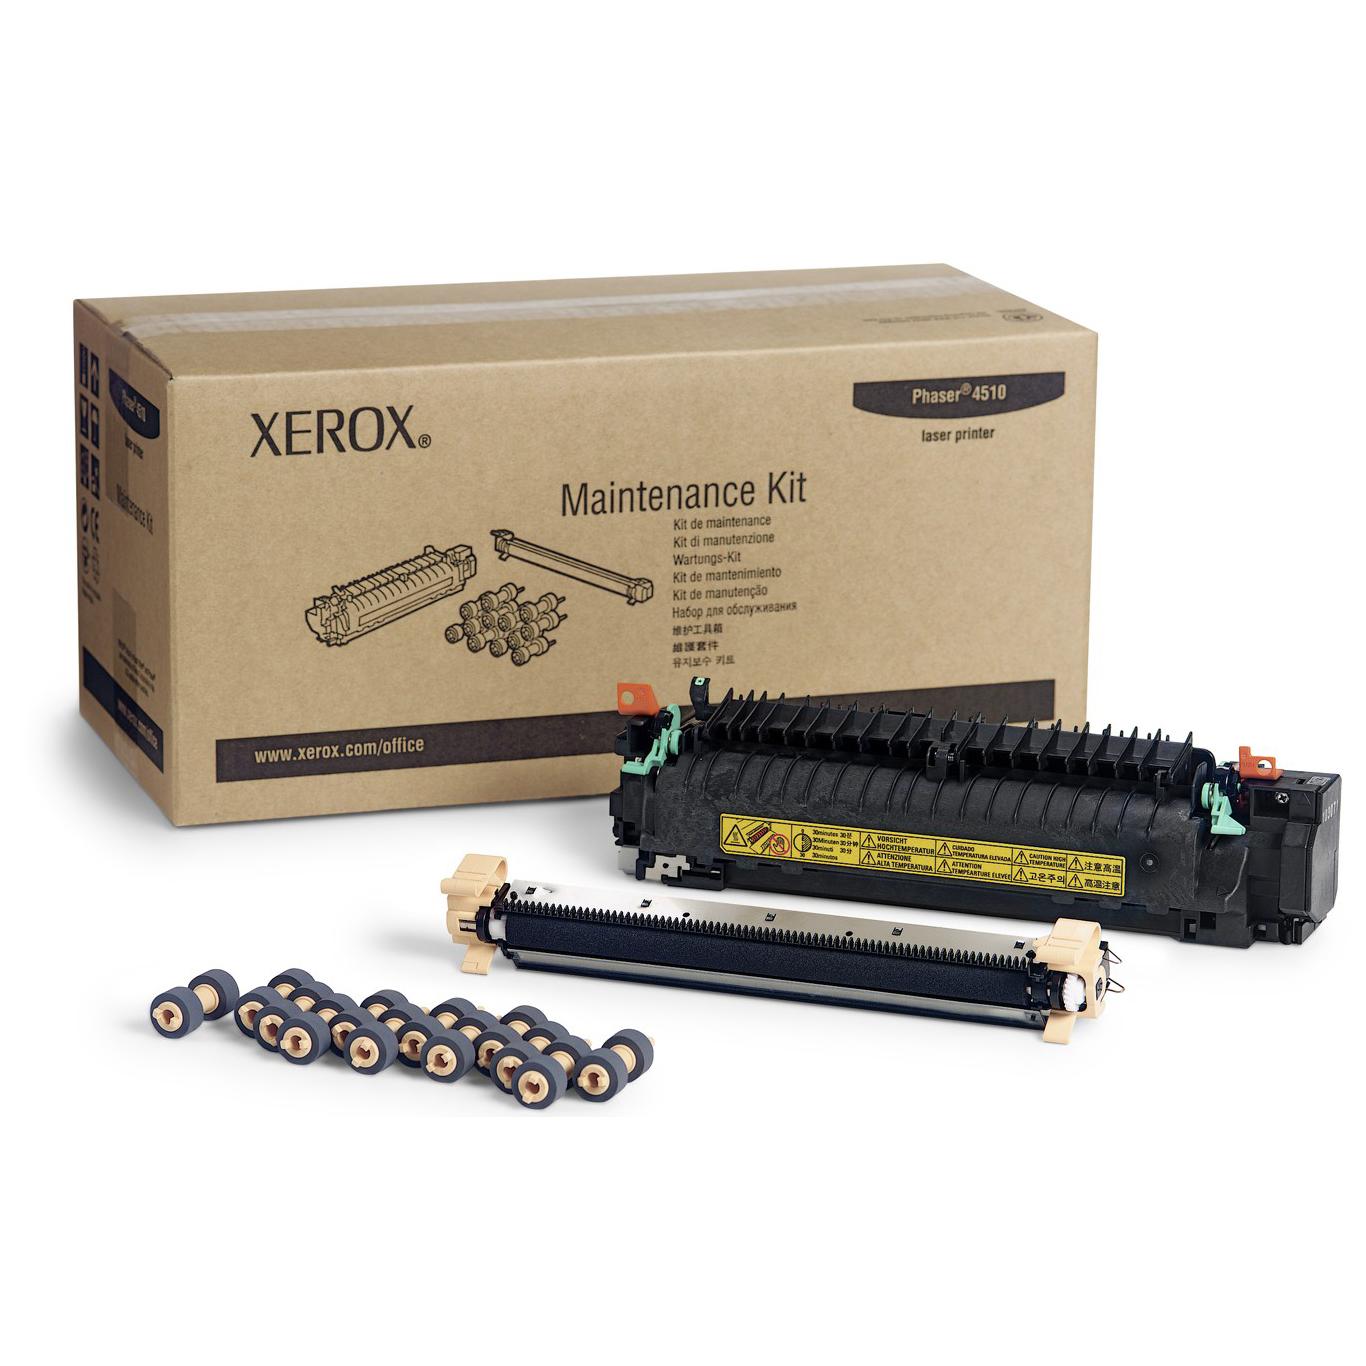 Fuji Xerox P4510 Maintenance Kit